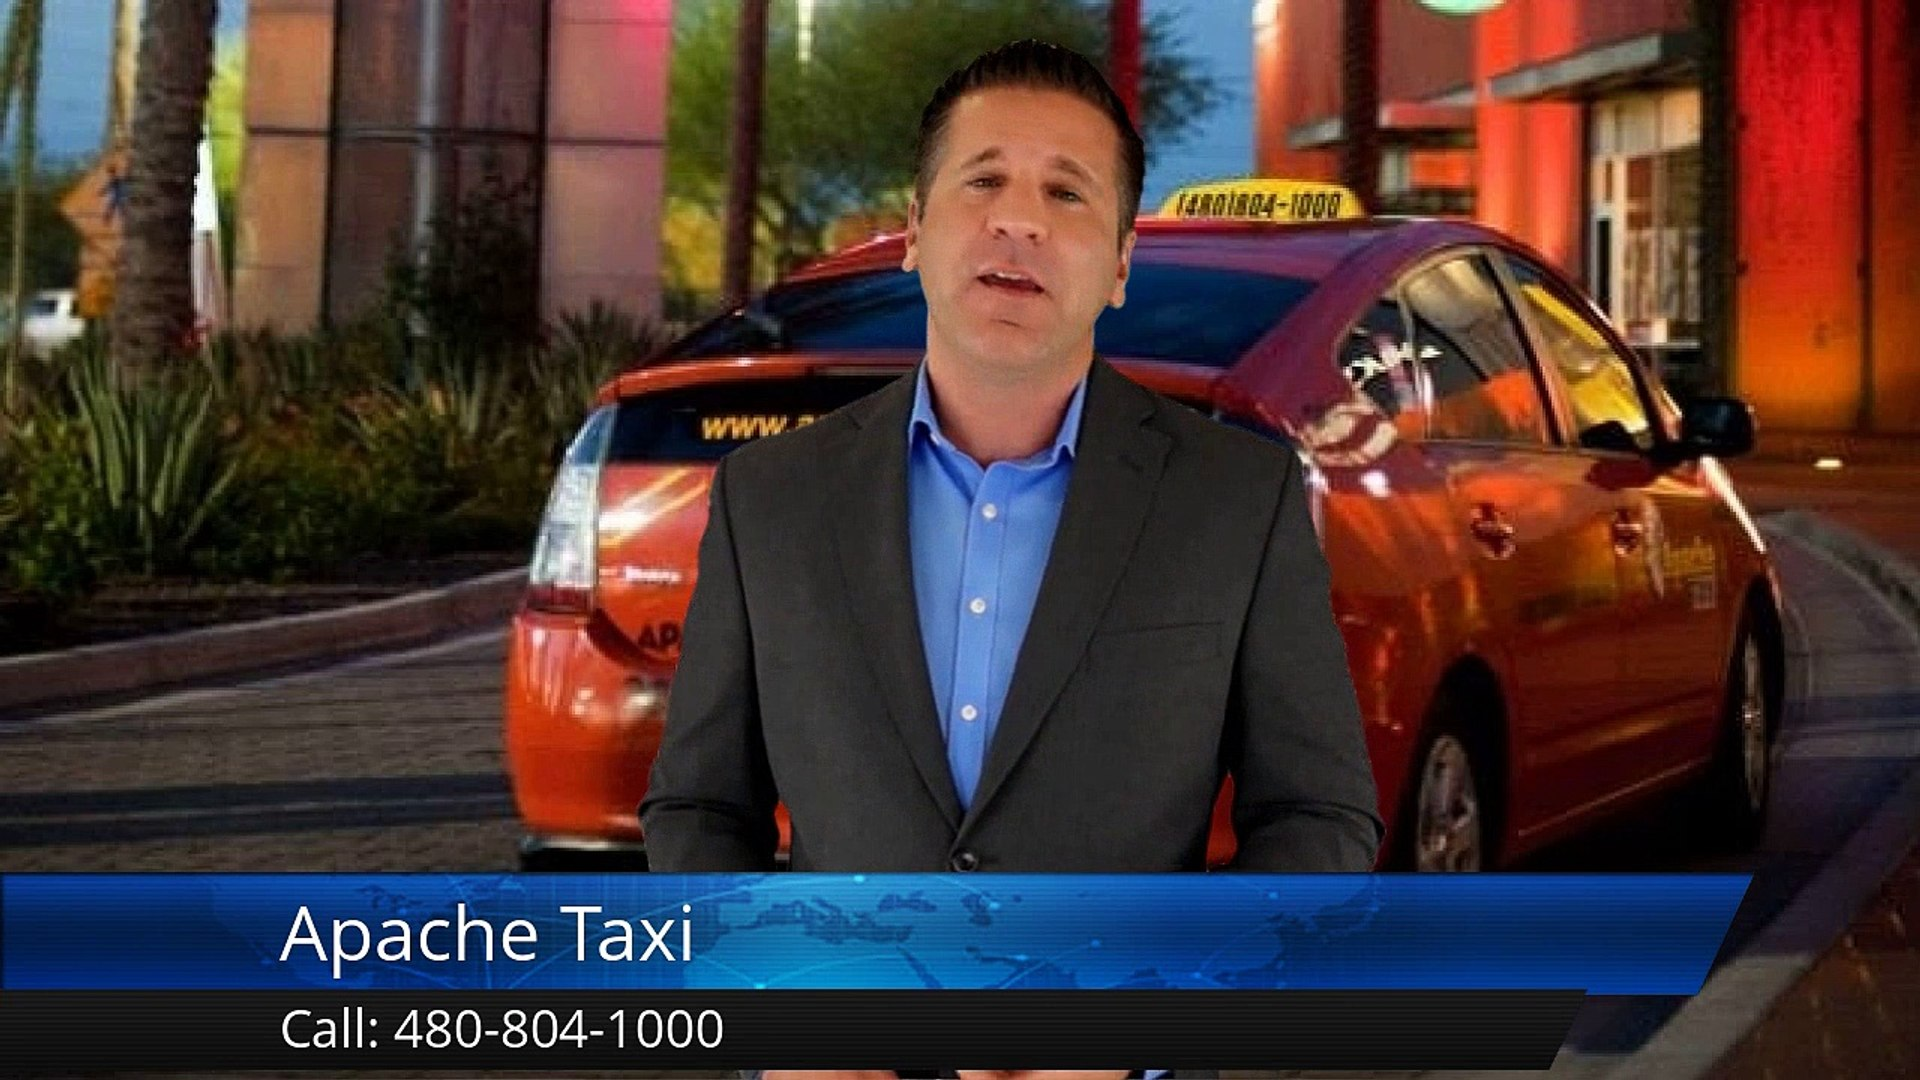 Apache Taxi Tempe PerfectFive Star Review by Joseph G.